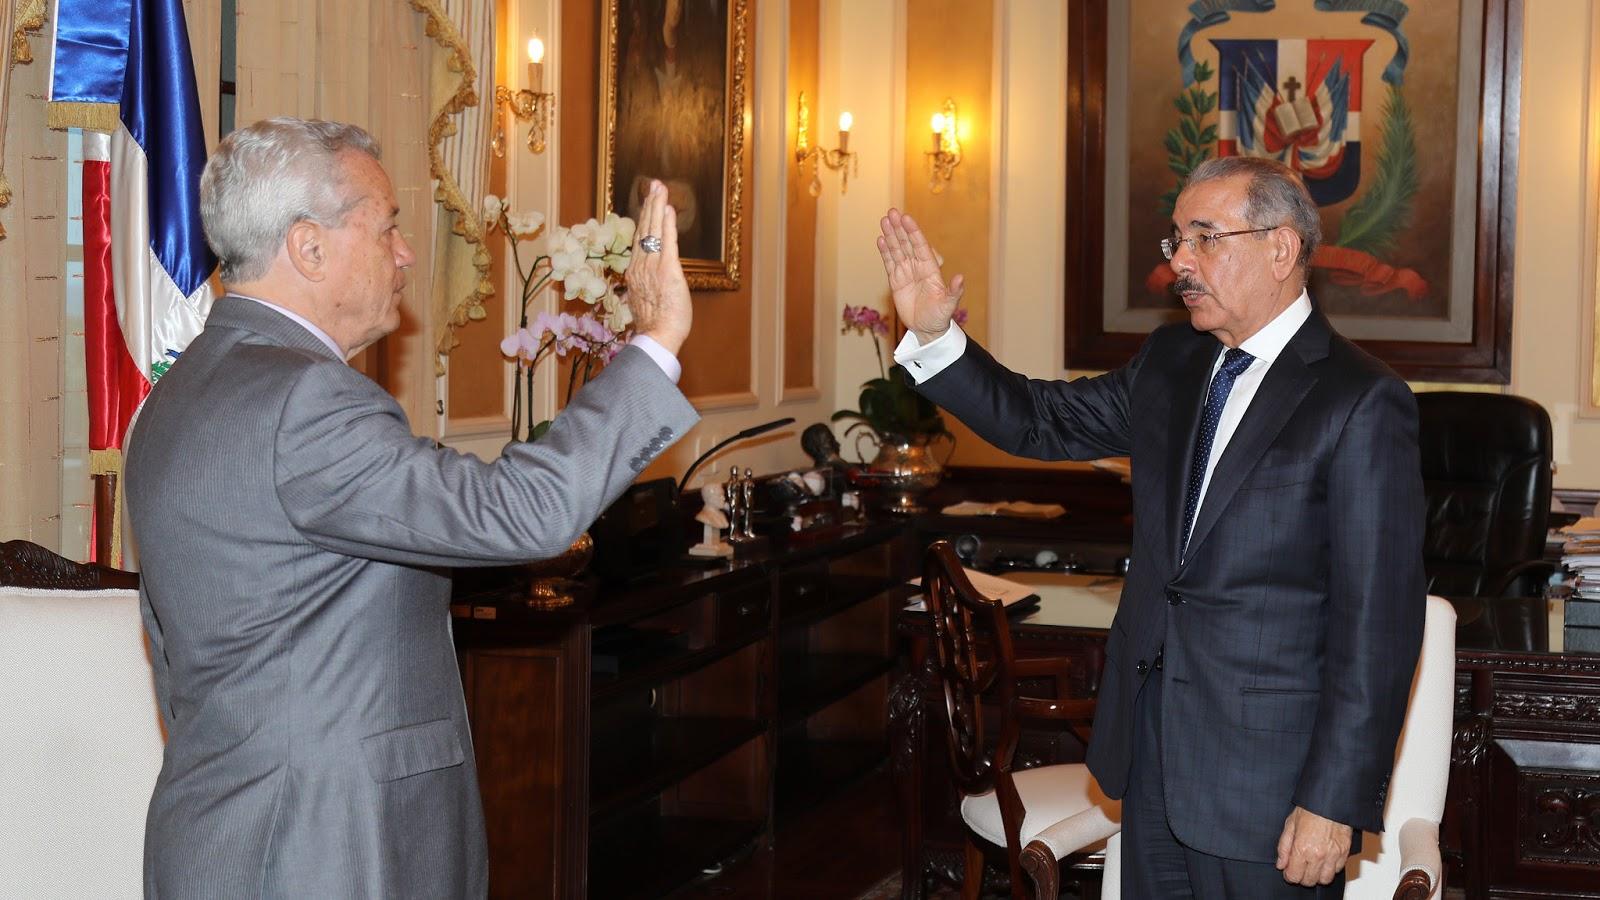 Danilo Medina juramenta a Nelson Toca Simó, ministro de Industria, Comercio y Mipymes